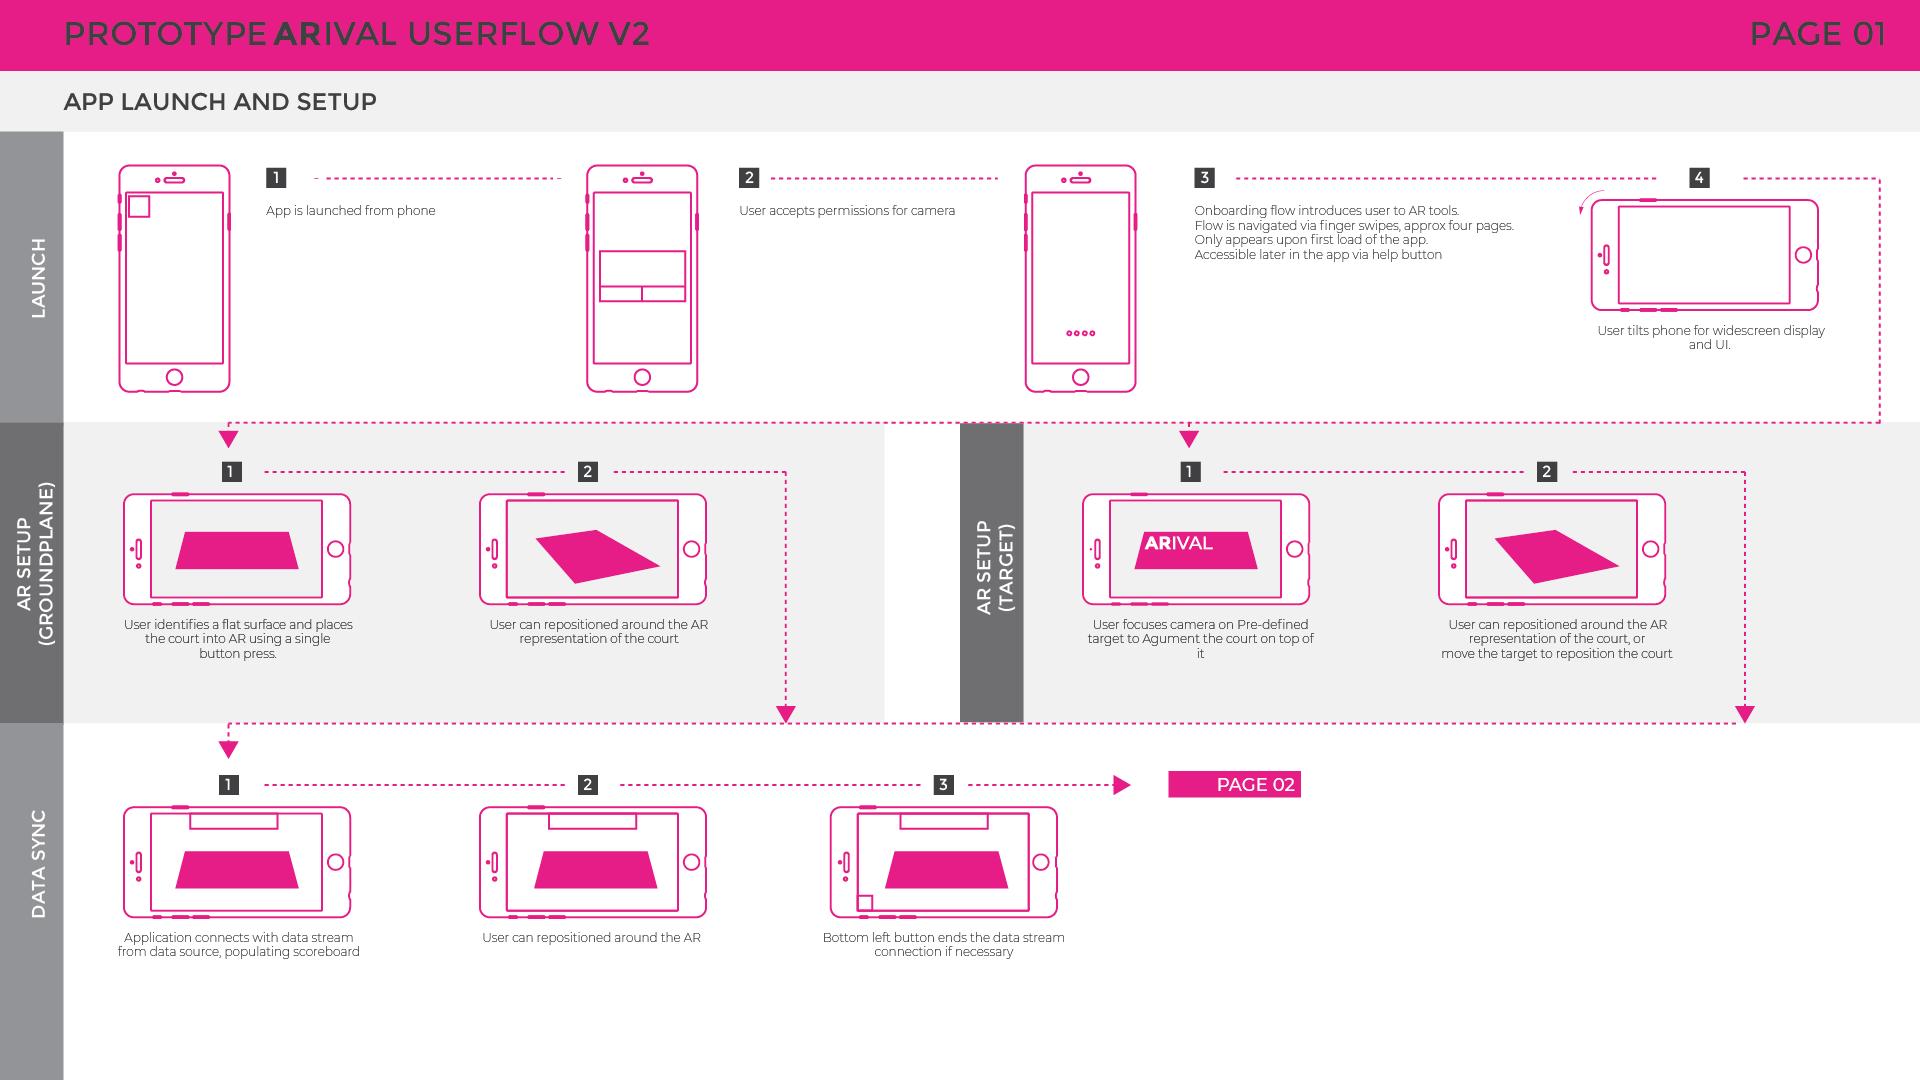 ARival Prototype Userflow v2-01.png